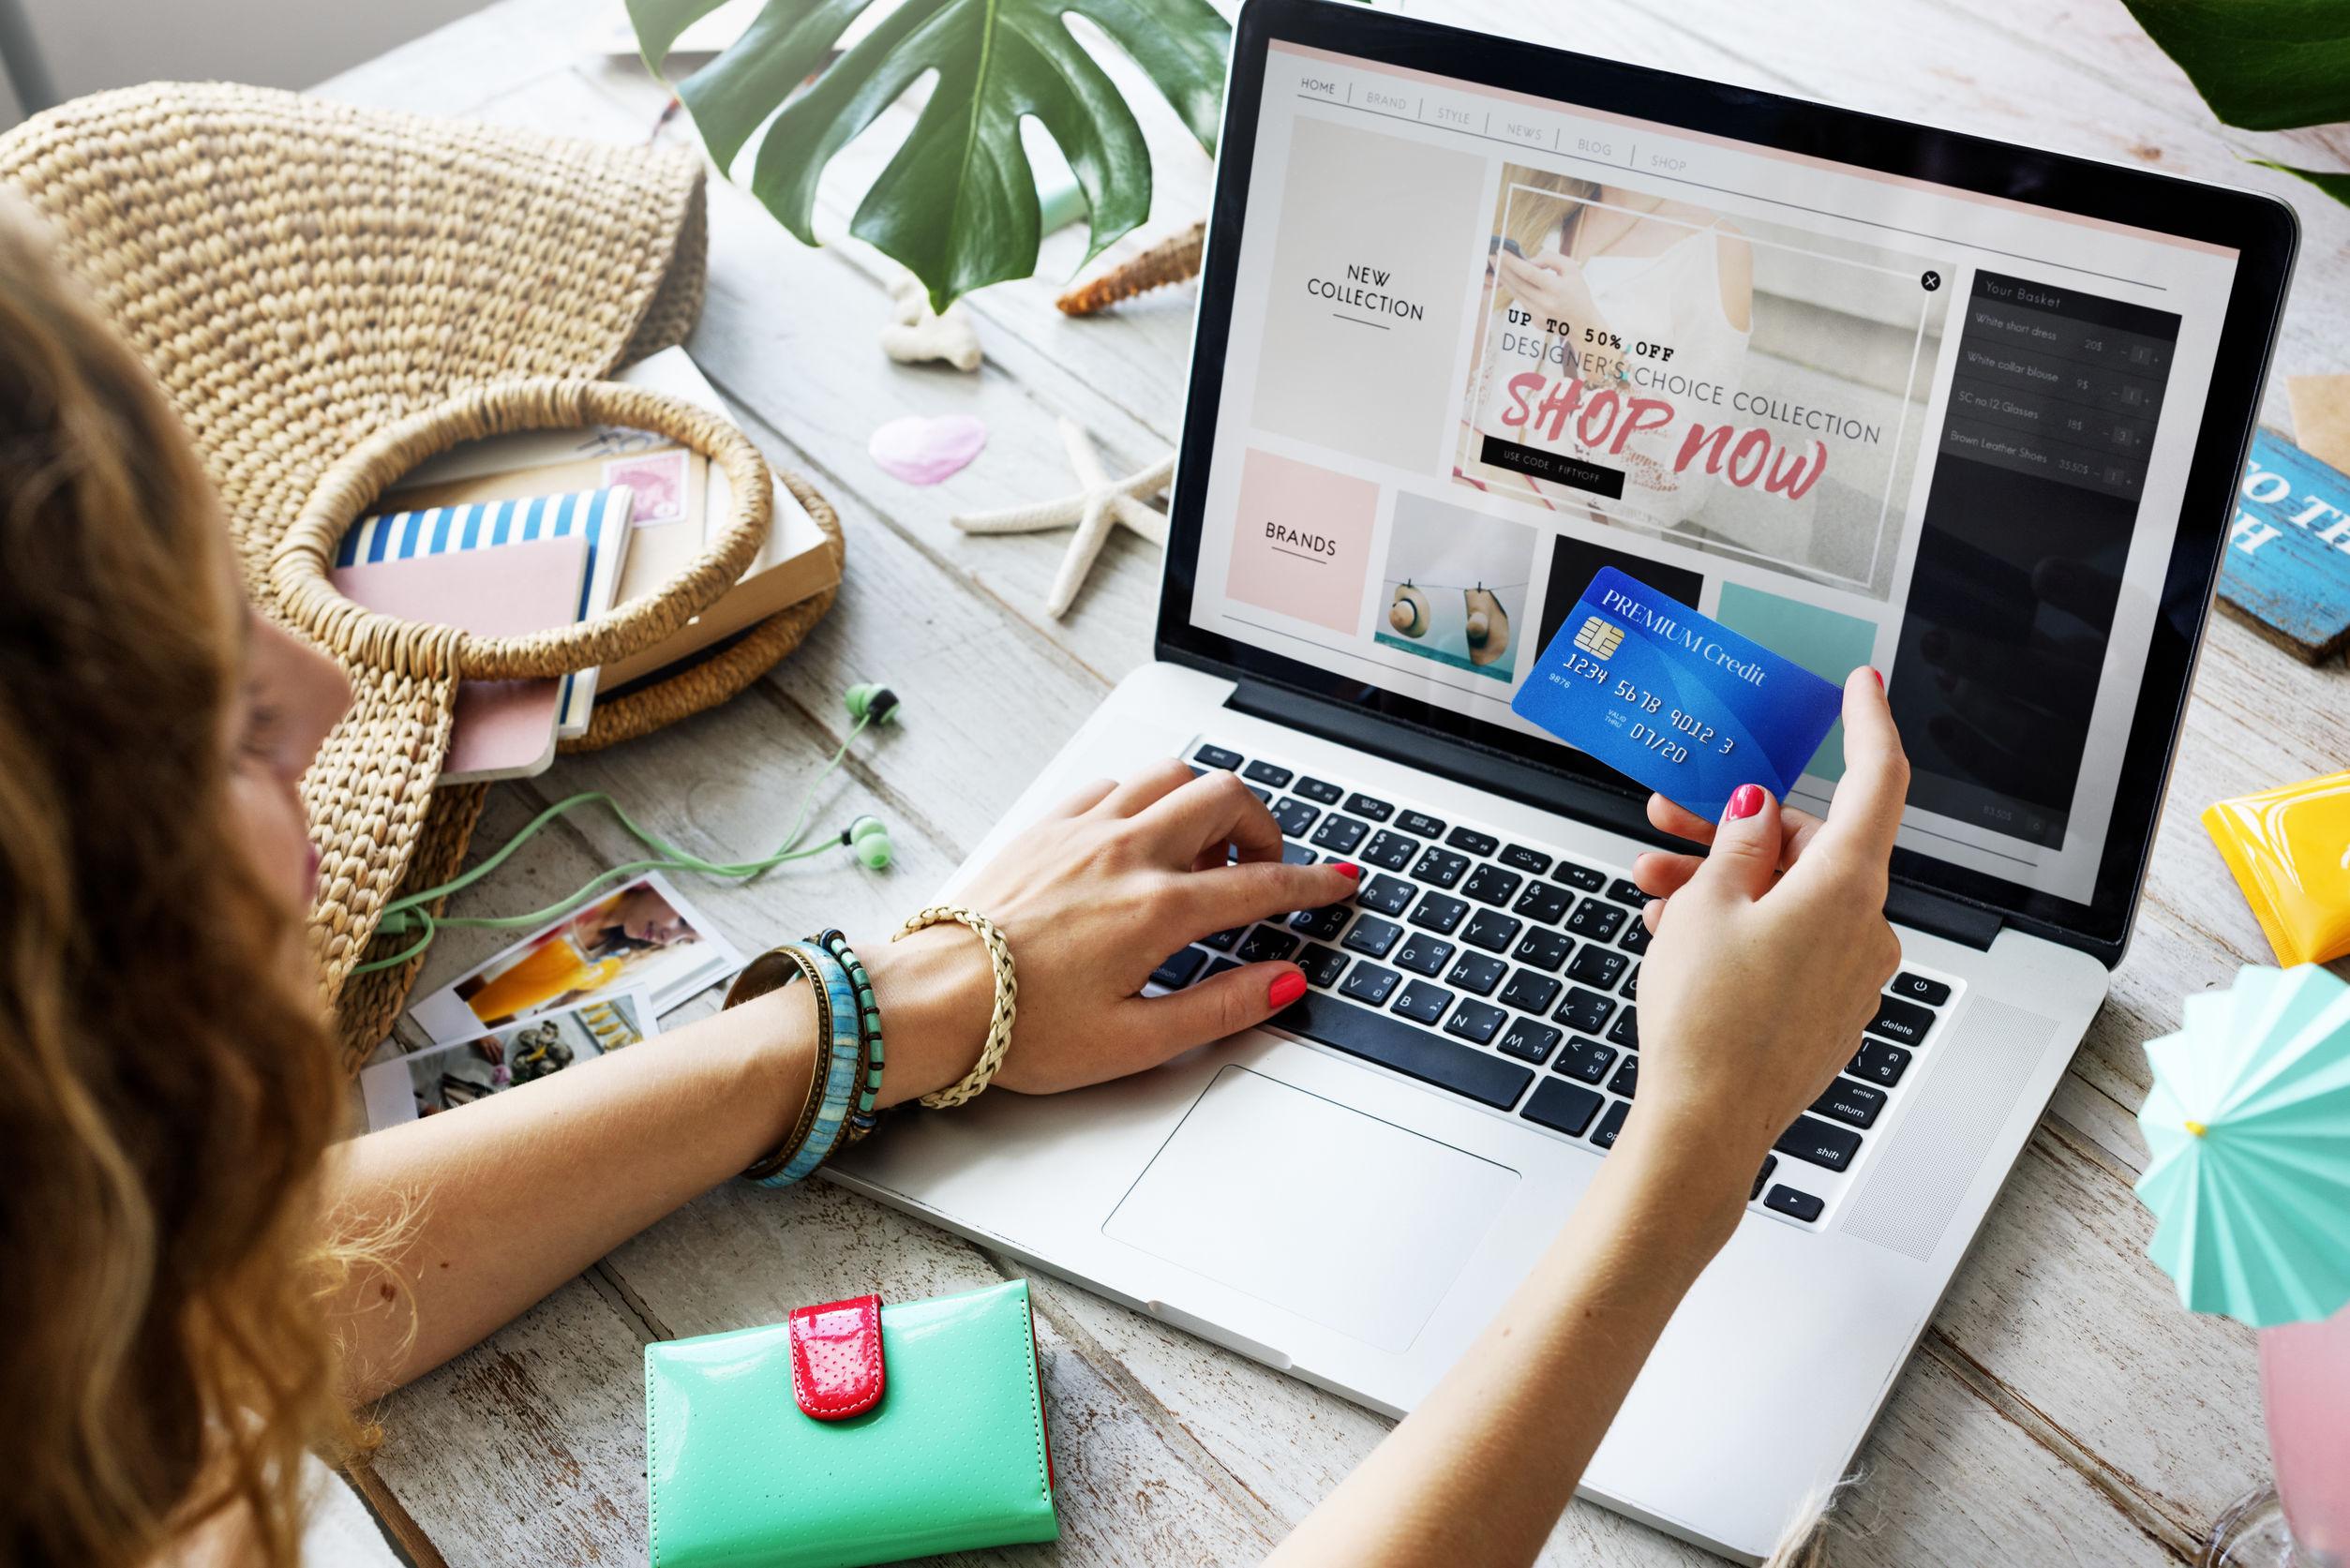 5 Program Promo untuk Bisnis Online